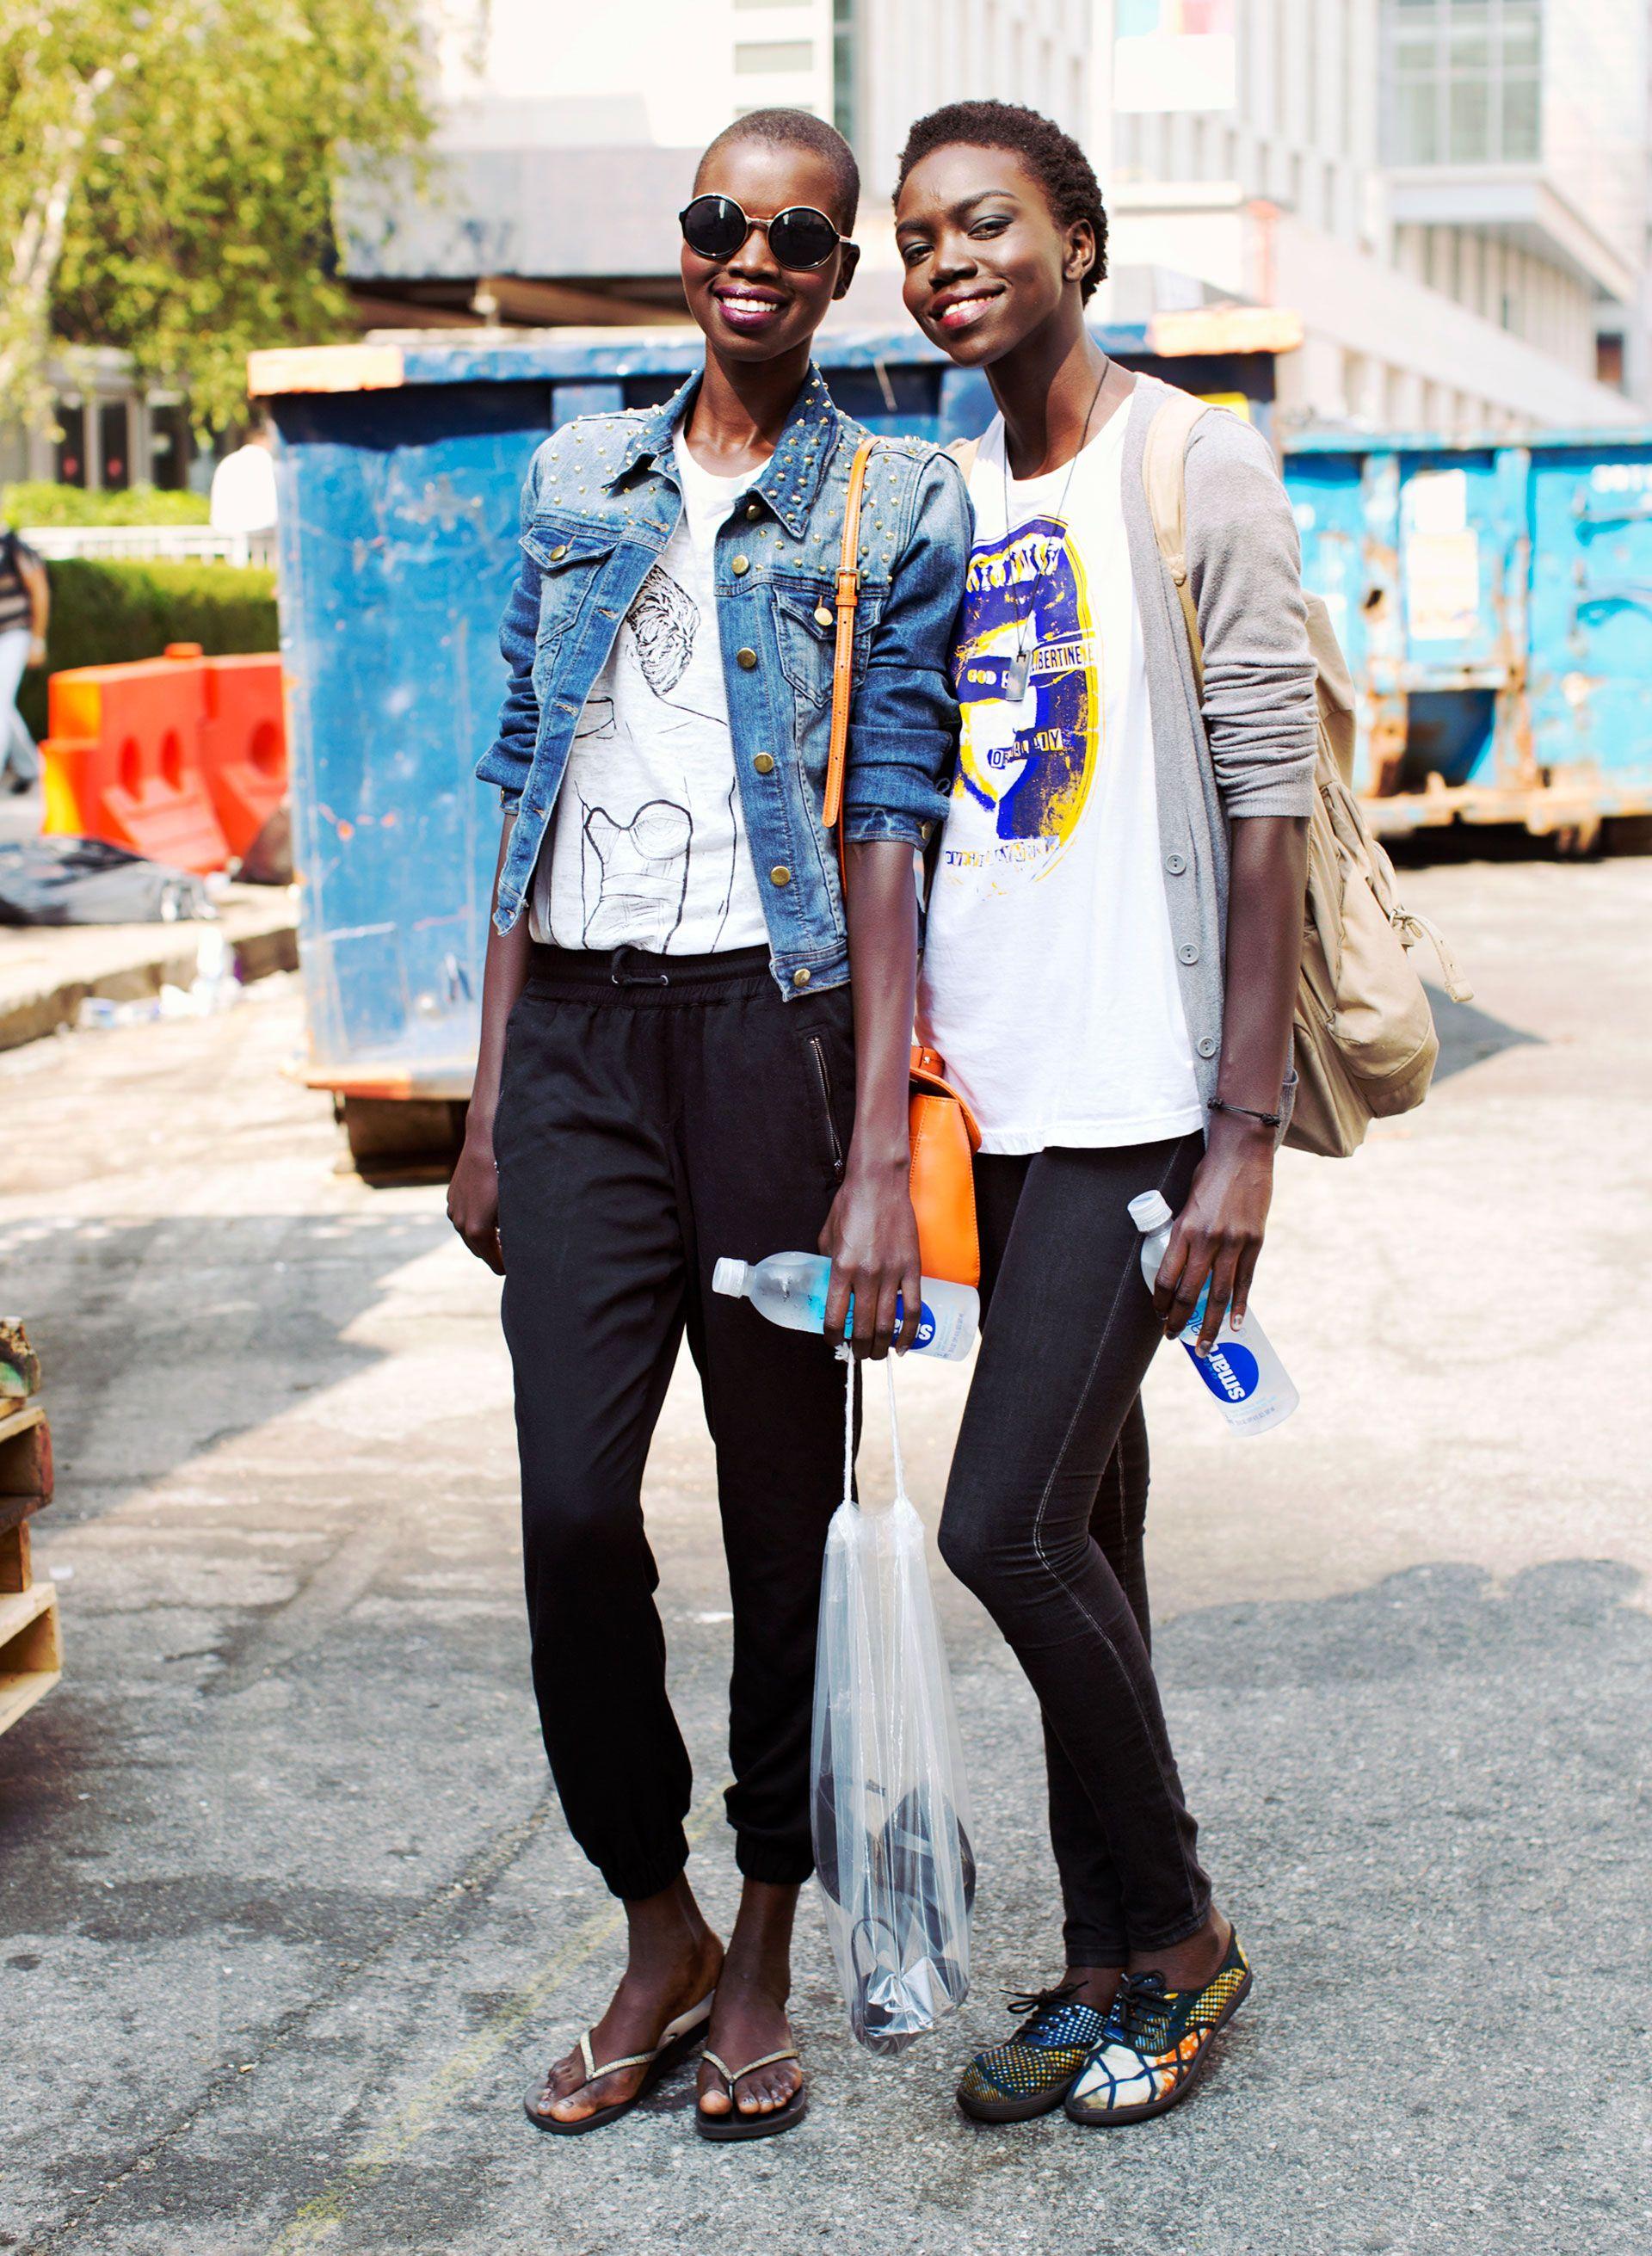 314bc8f981 Model Street Style at Spring 2014 Fashion Week - NYFW Model Street ...